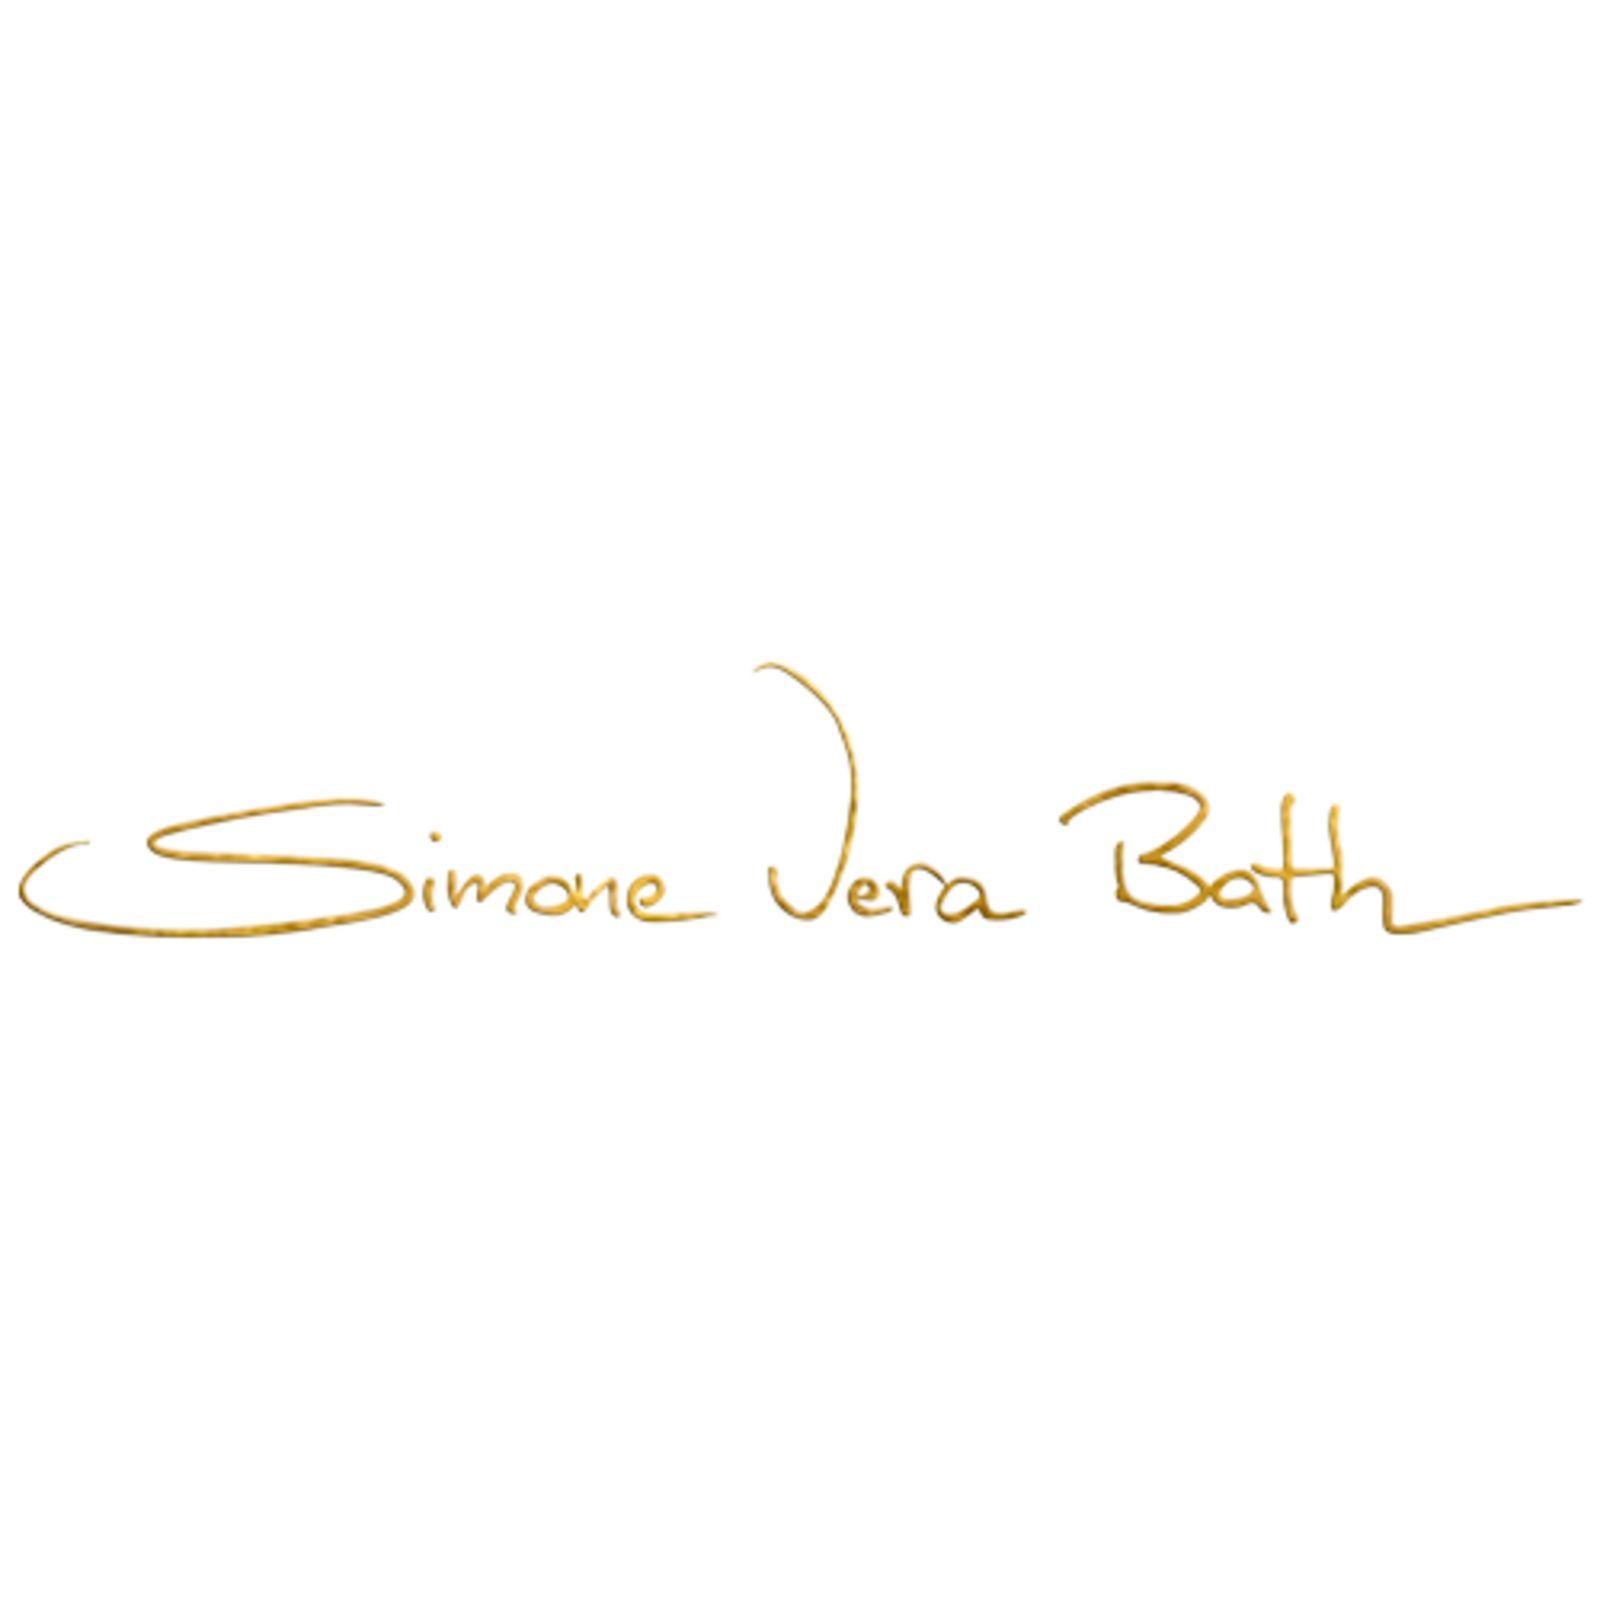 Simone Vera Bath